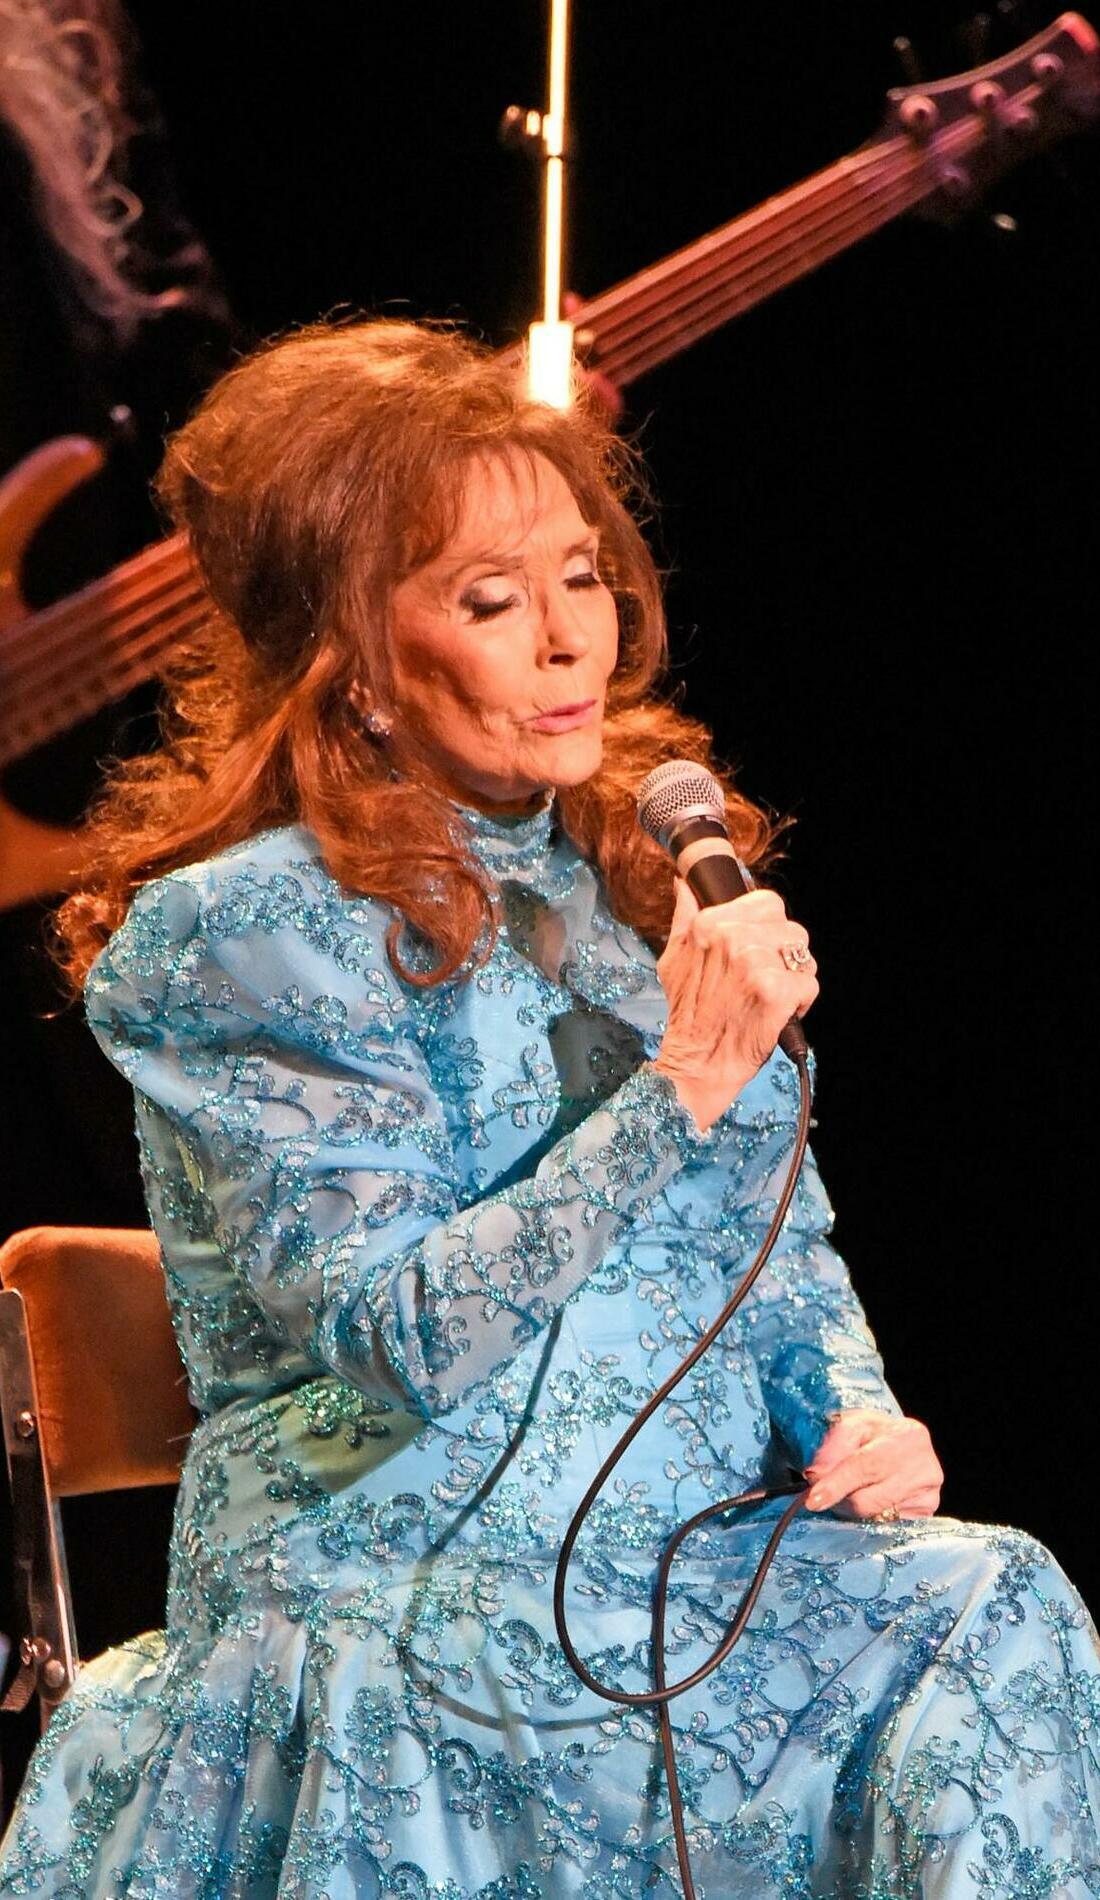 A Loretta Lynn live event